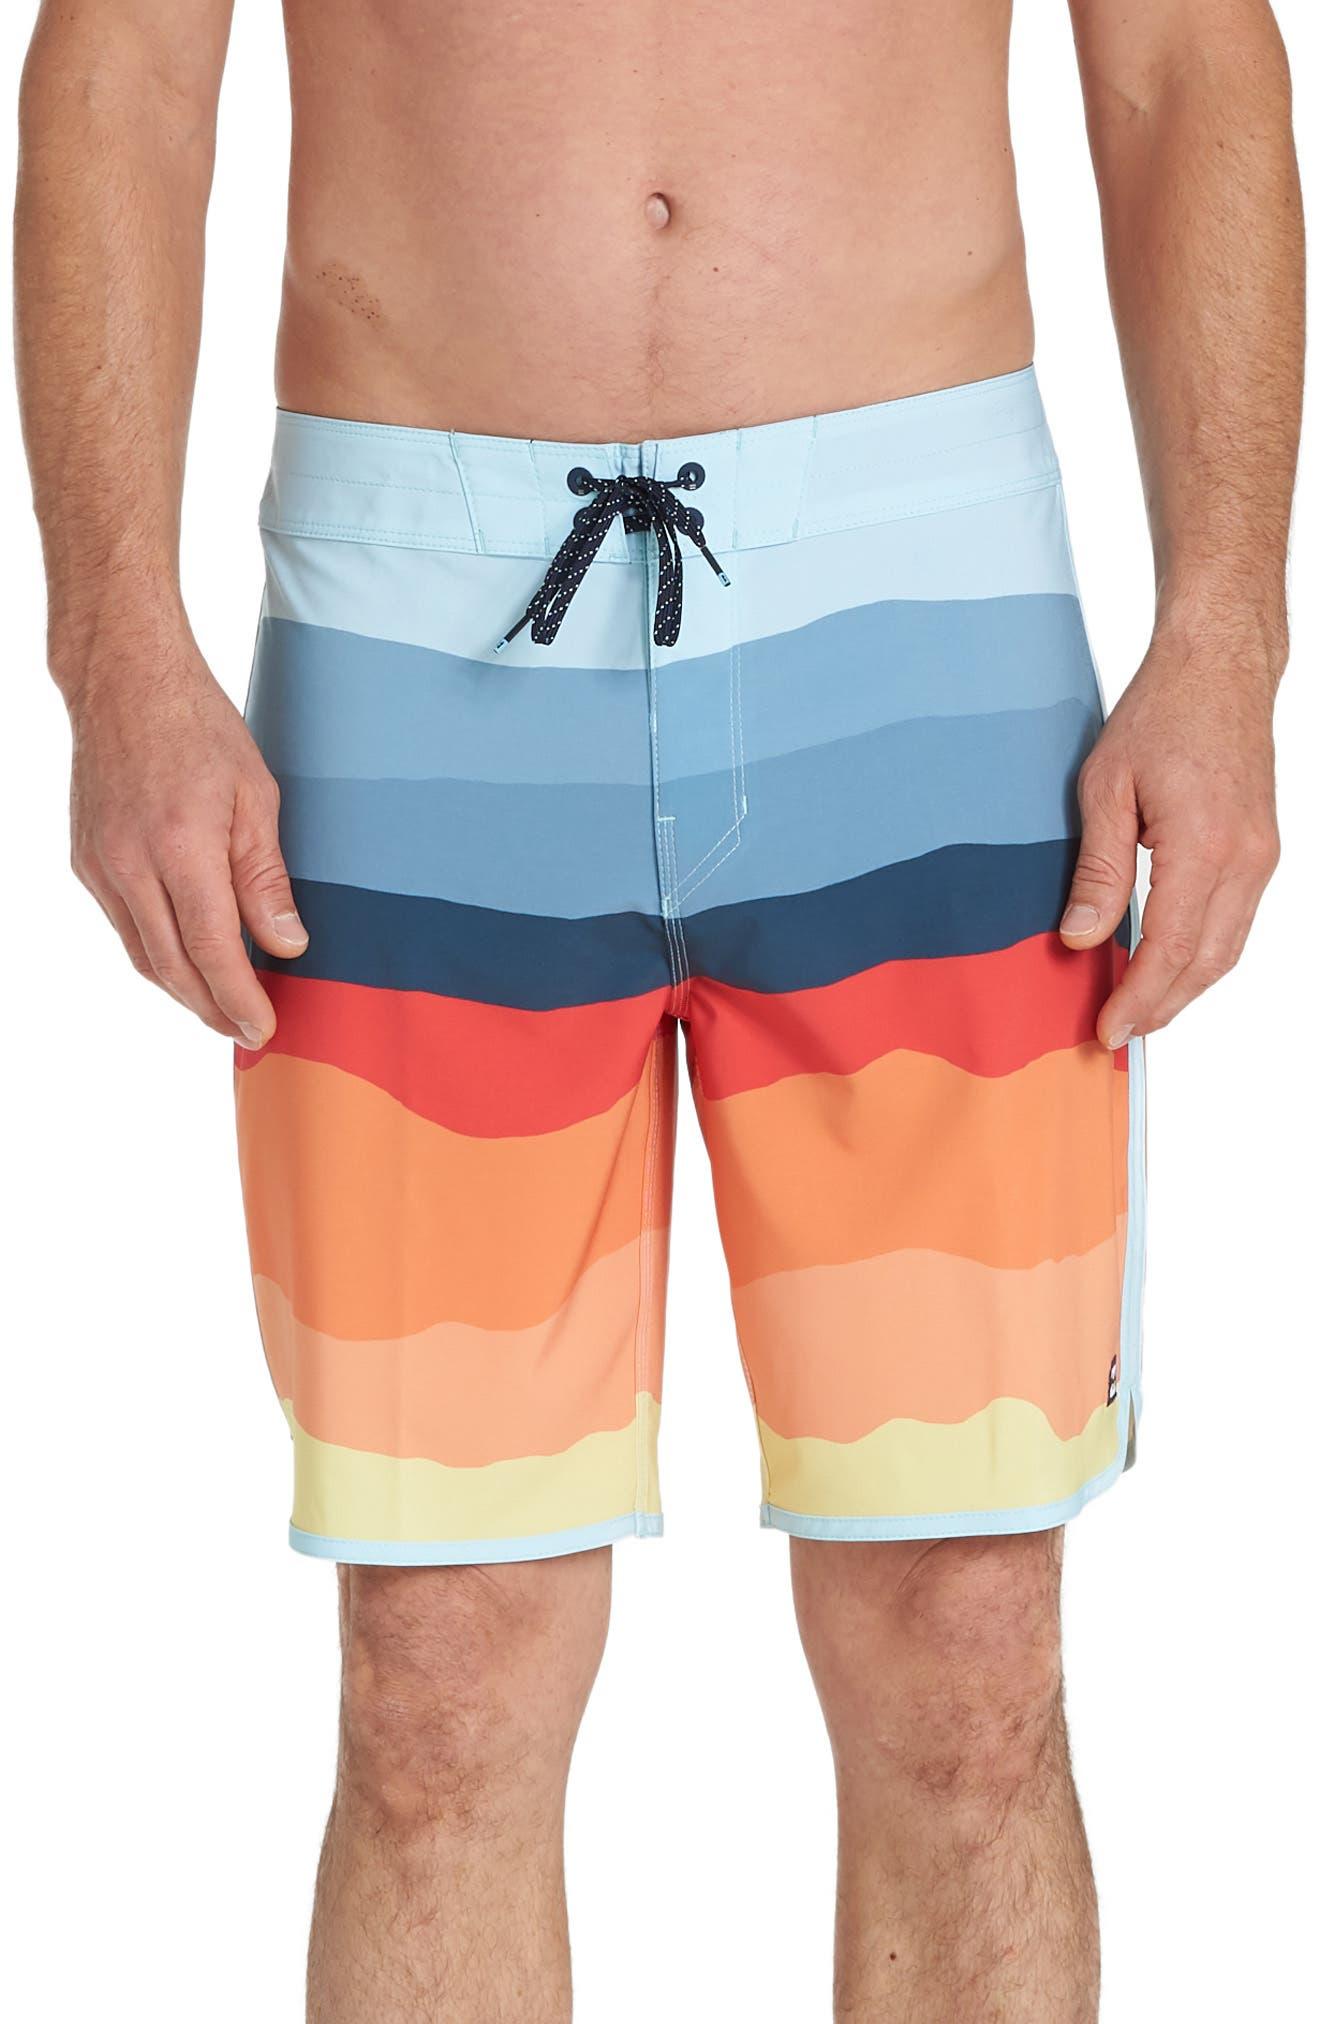 Billabong 73 Line Up Pro Board Shorts, Orange